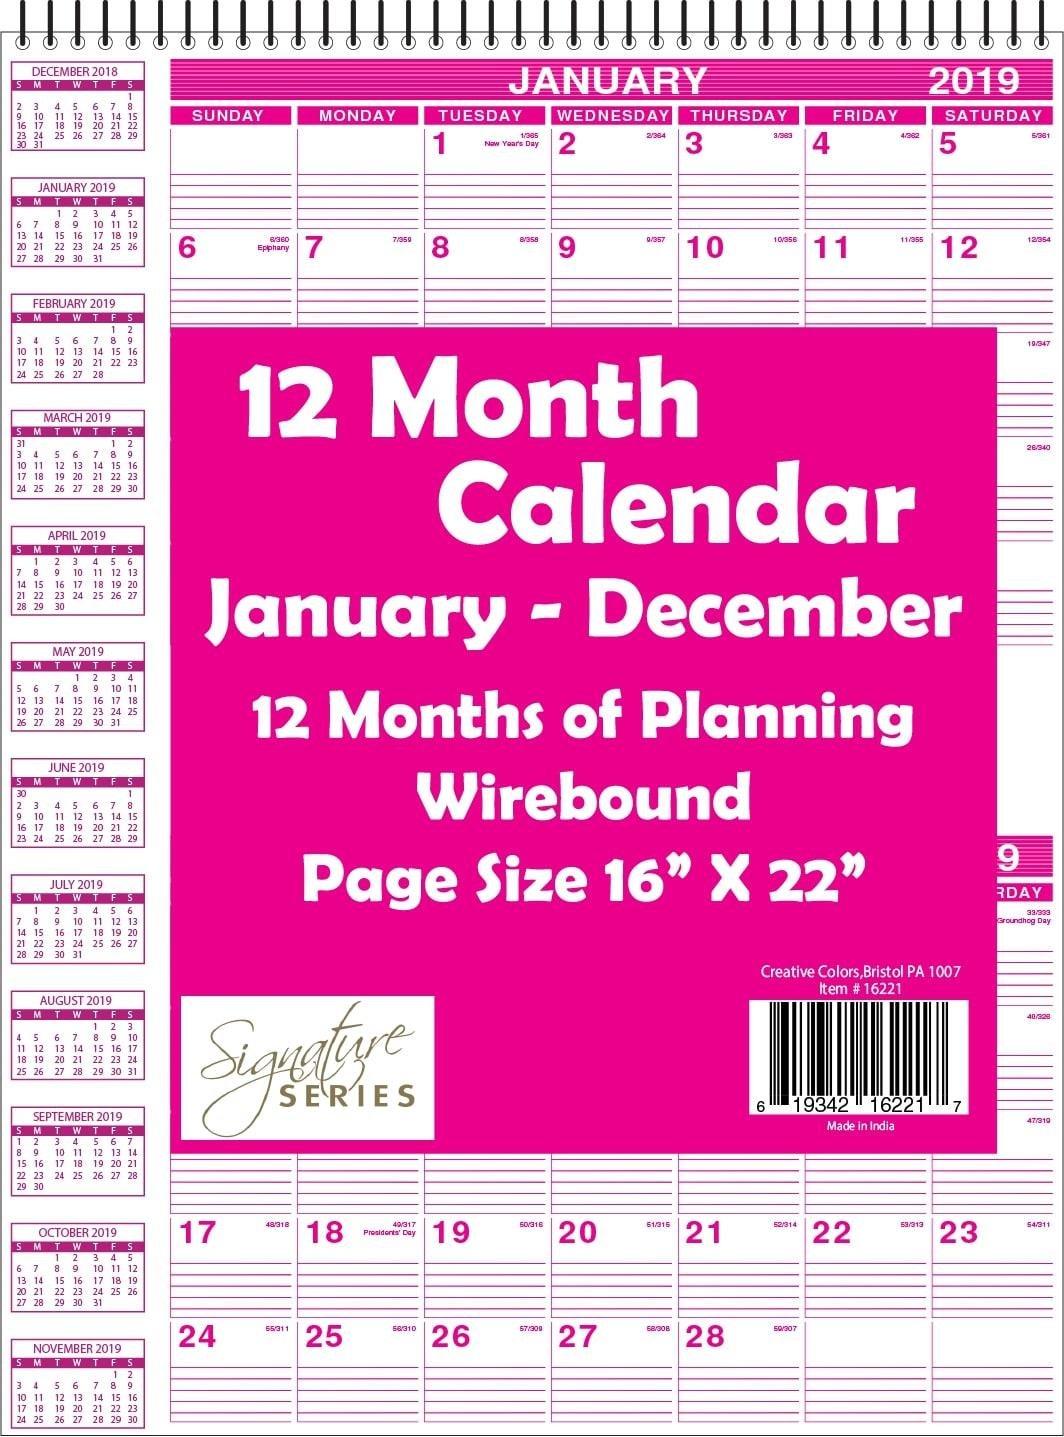 "Bulk Carton 16"" X 22"" Top Wired Wall Calendar 2019- Minimum Order 1 Calendar 2019 Bulk"